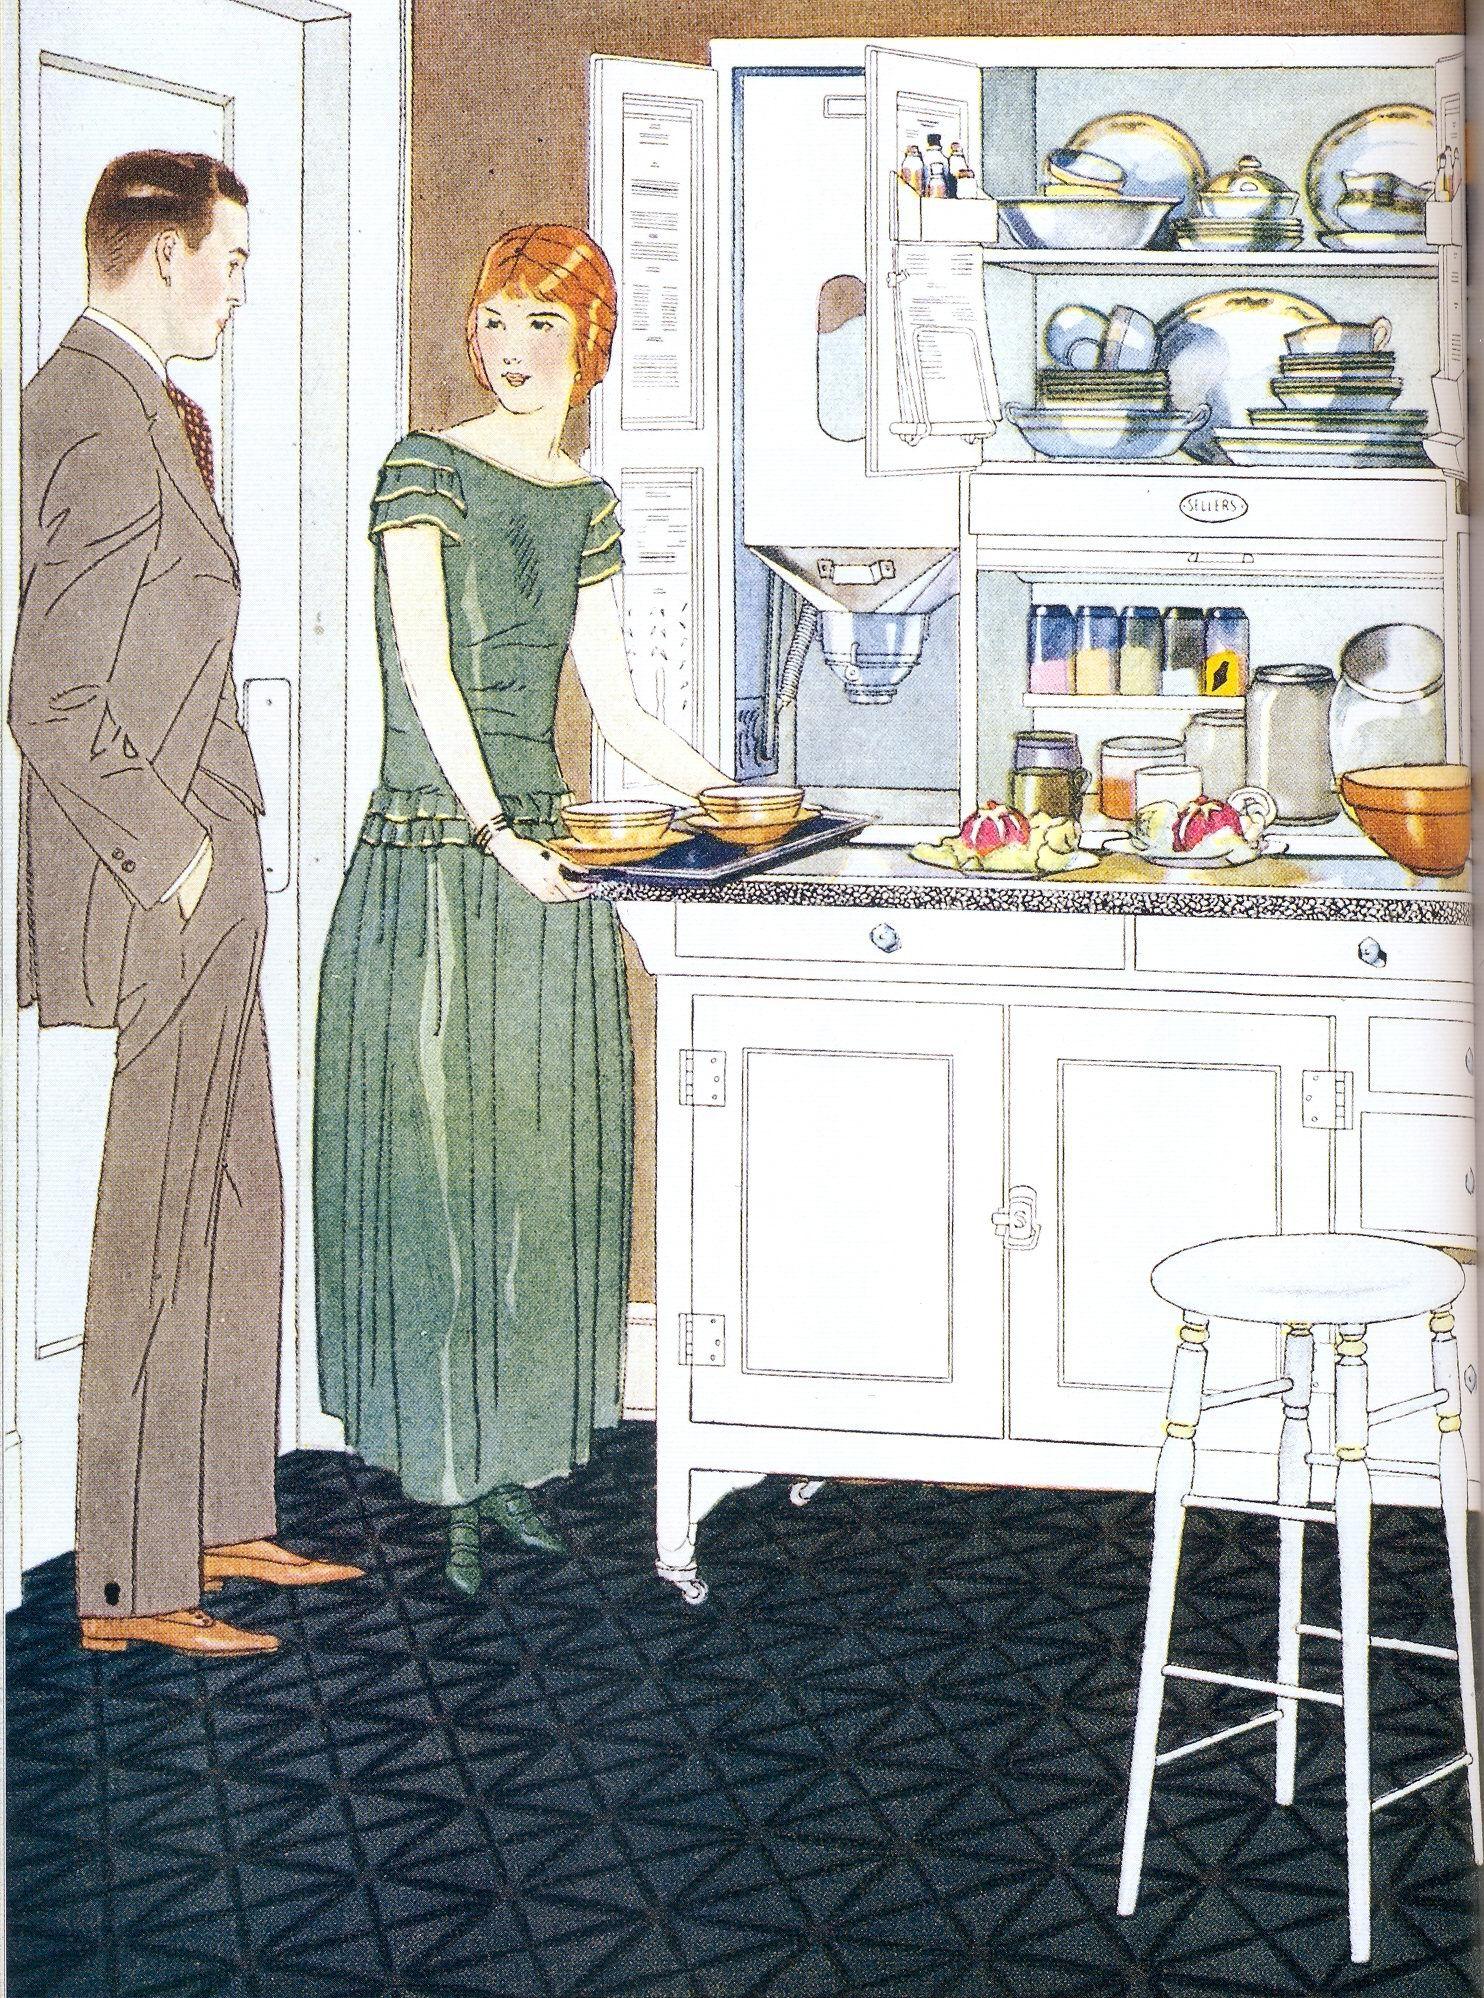 1920s kitchen - Google Search | Art deco kitchen, Vintage ...